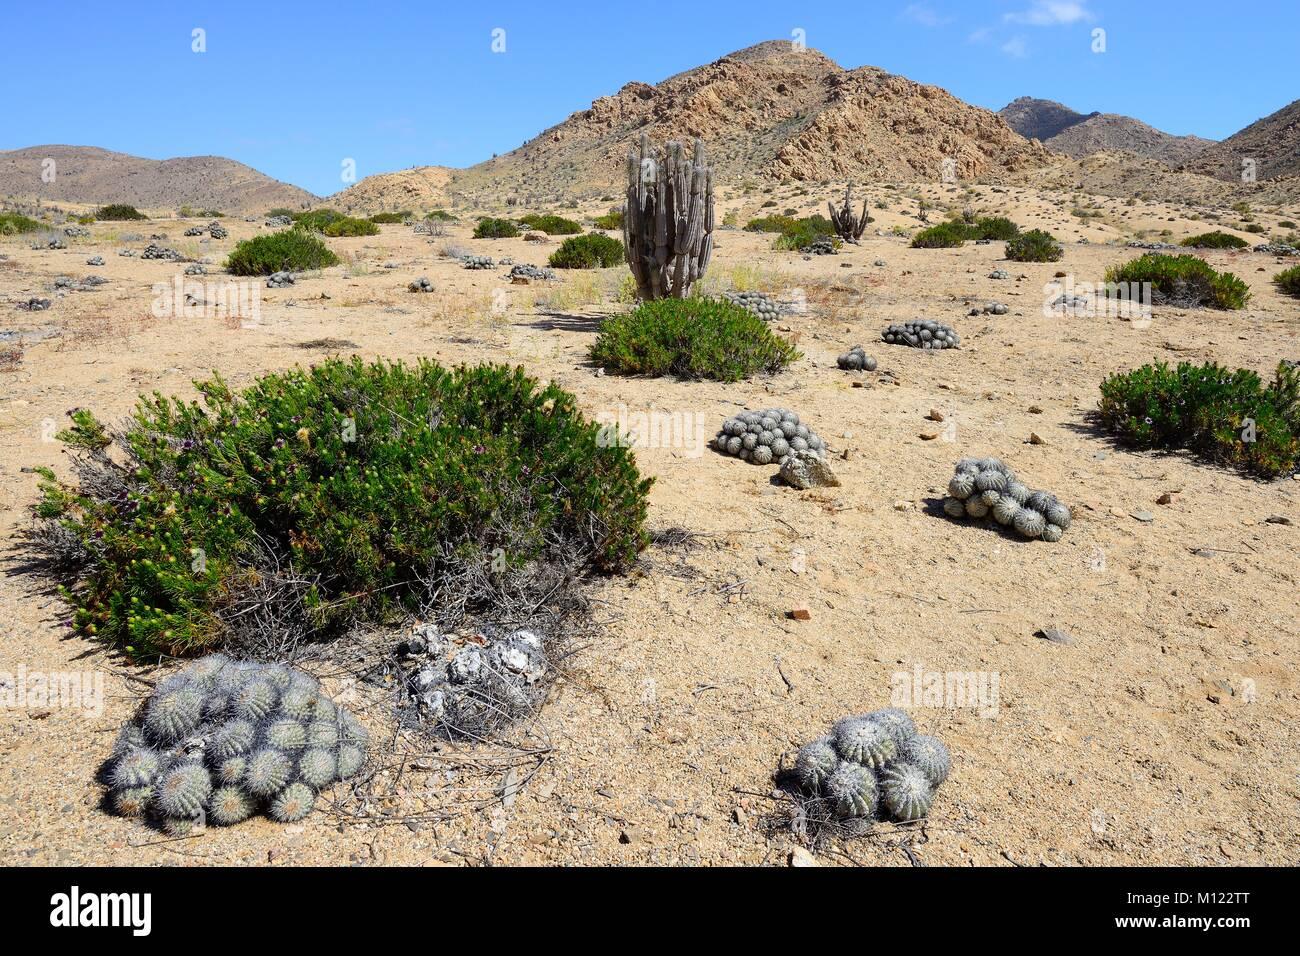 Landscape with cacti (Copiapoa cinerascens) and columnar cactus (Eulychnia iquiquensis),Pan de Azúcar National - Stock Image